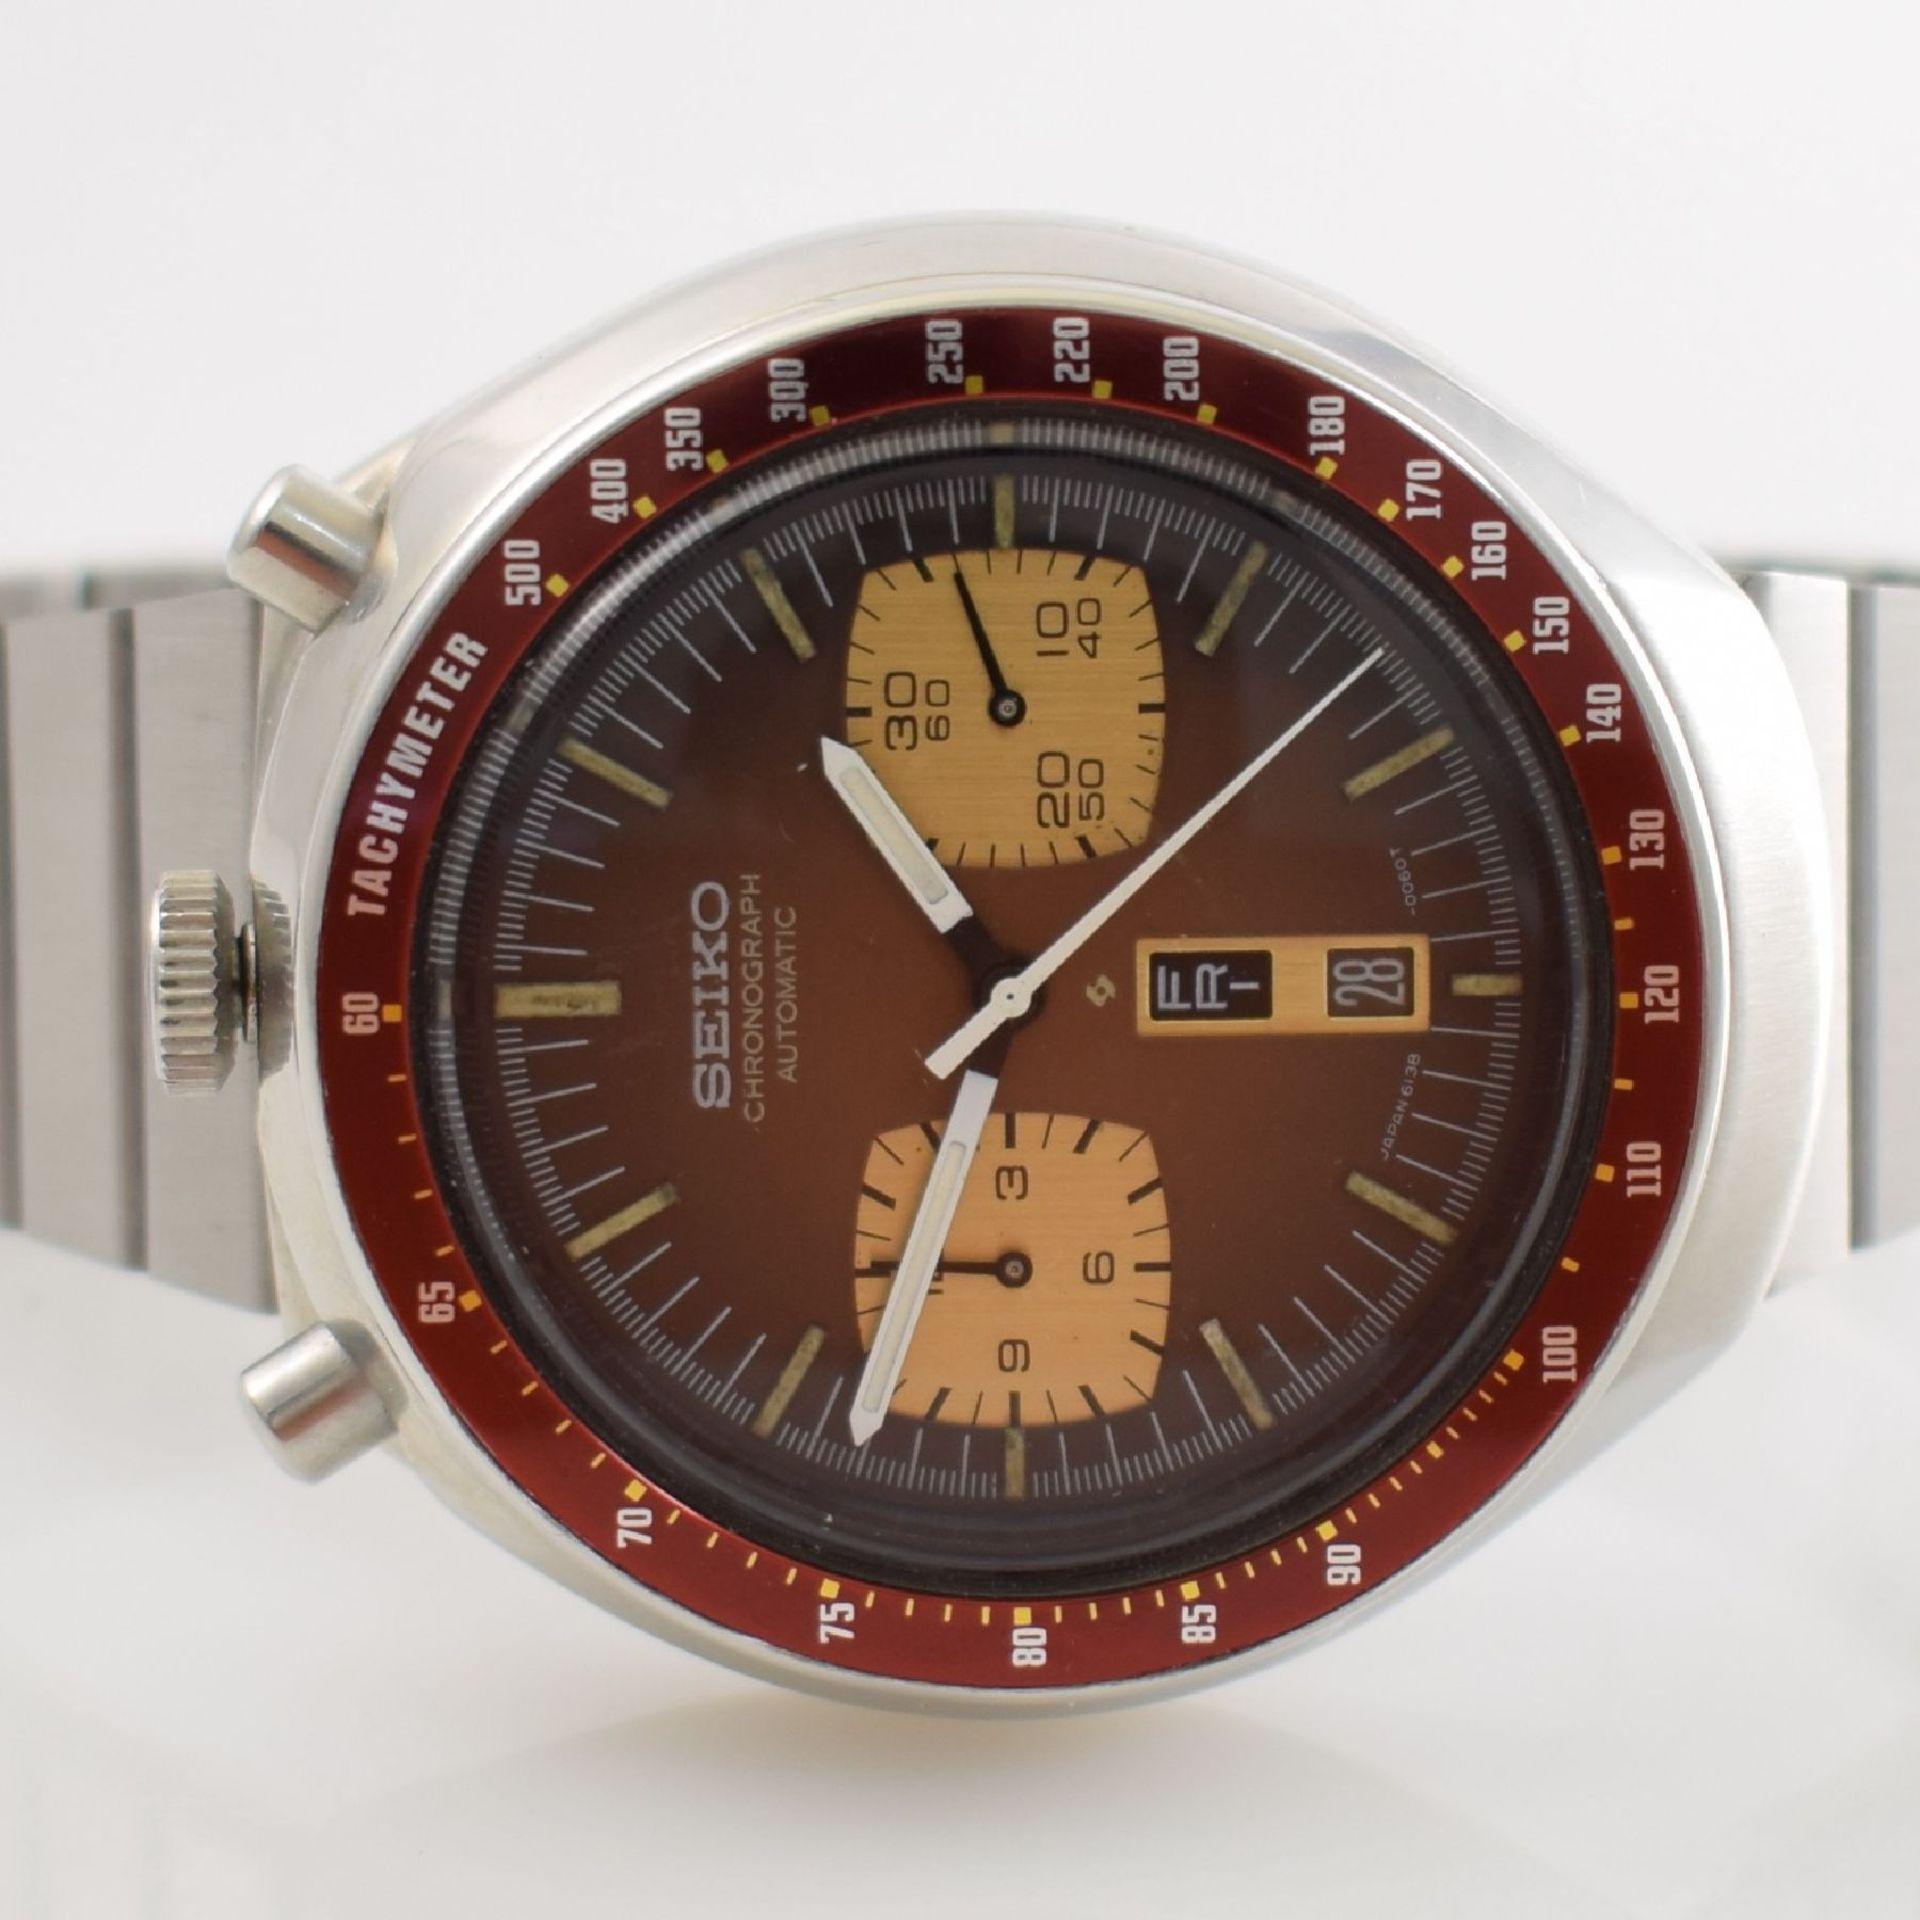 SEIKO sog. BULLHEAD Armbandchronograph, Japan um 1970, Automatik, Ref. 6138-0040, verschr. - Bild 2 aus 7